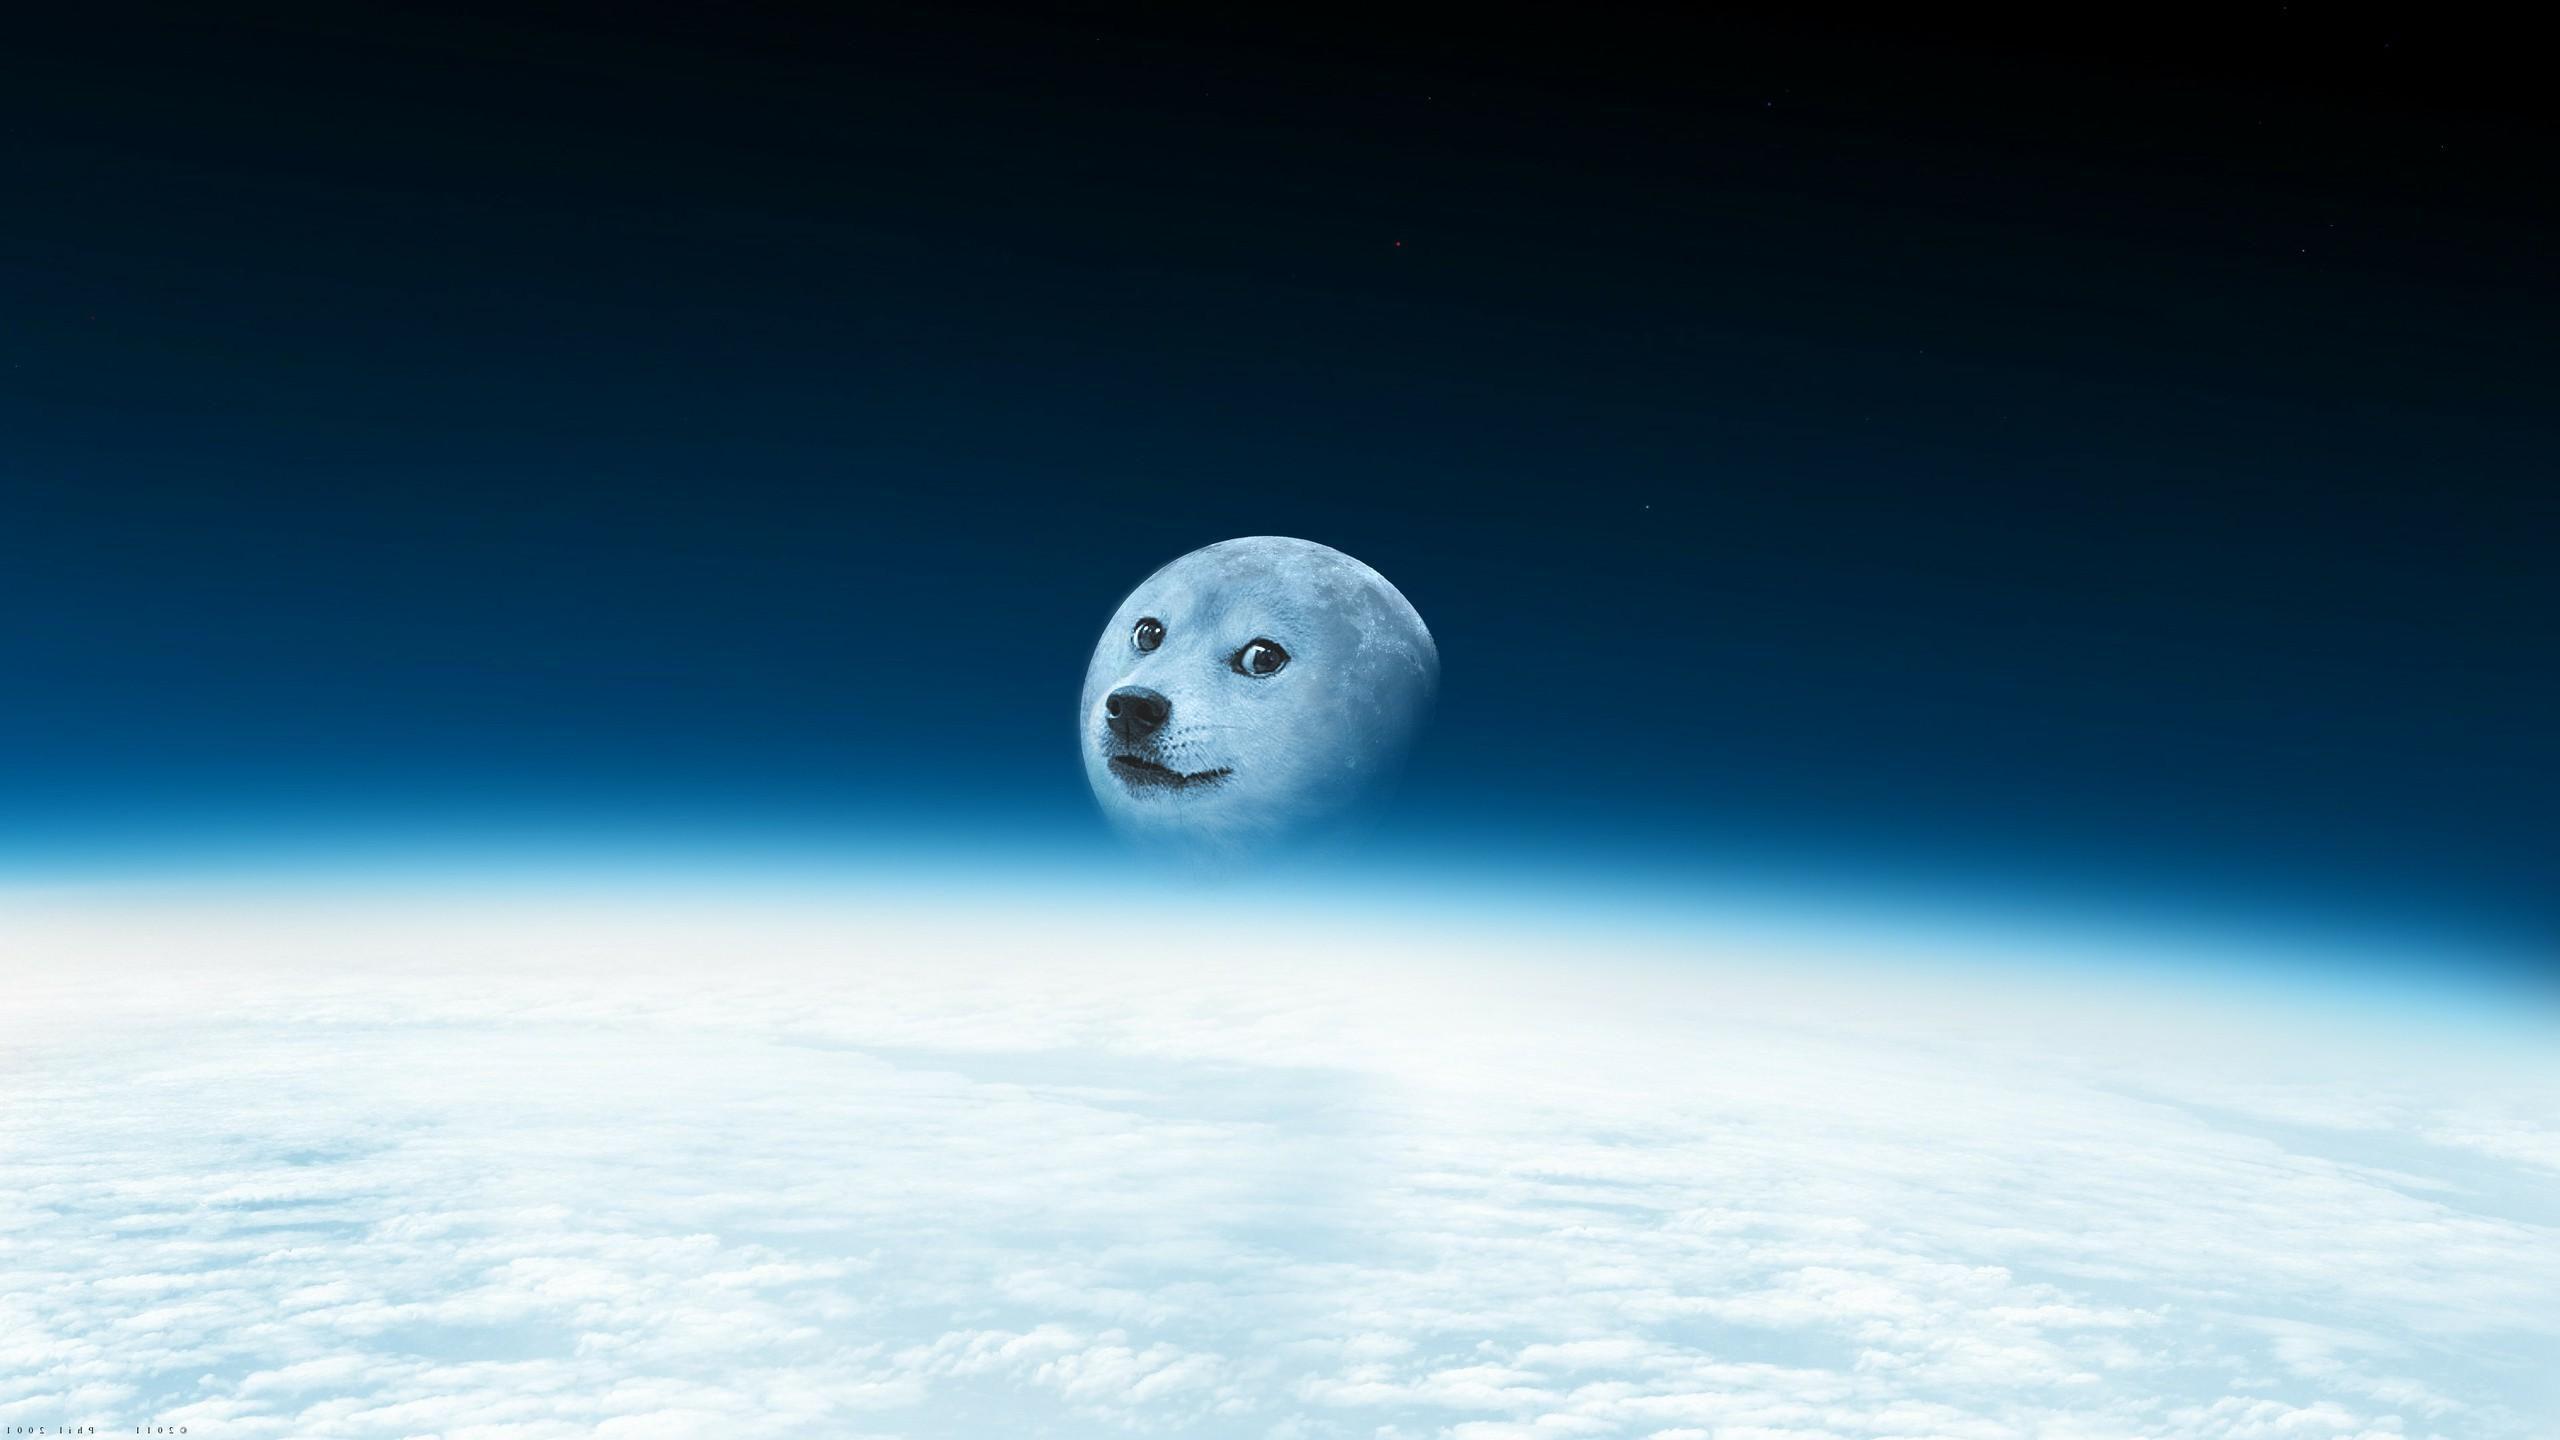 Doge Wallpapers Doge meme, Desktop wallpaper, Beautiful